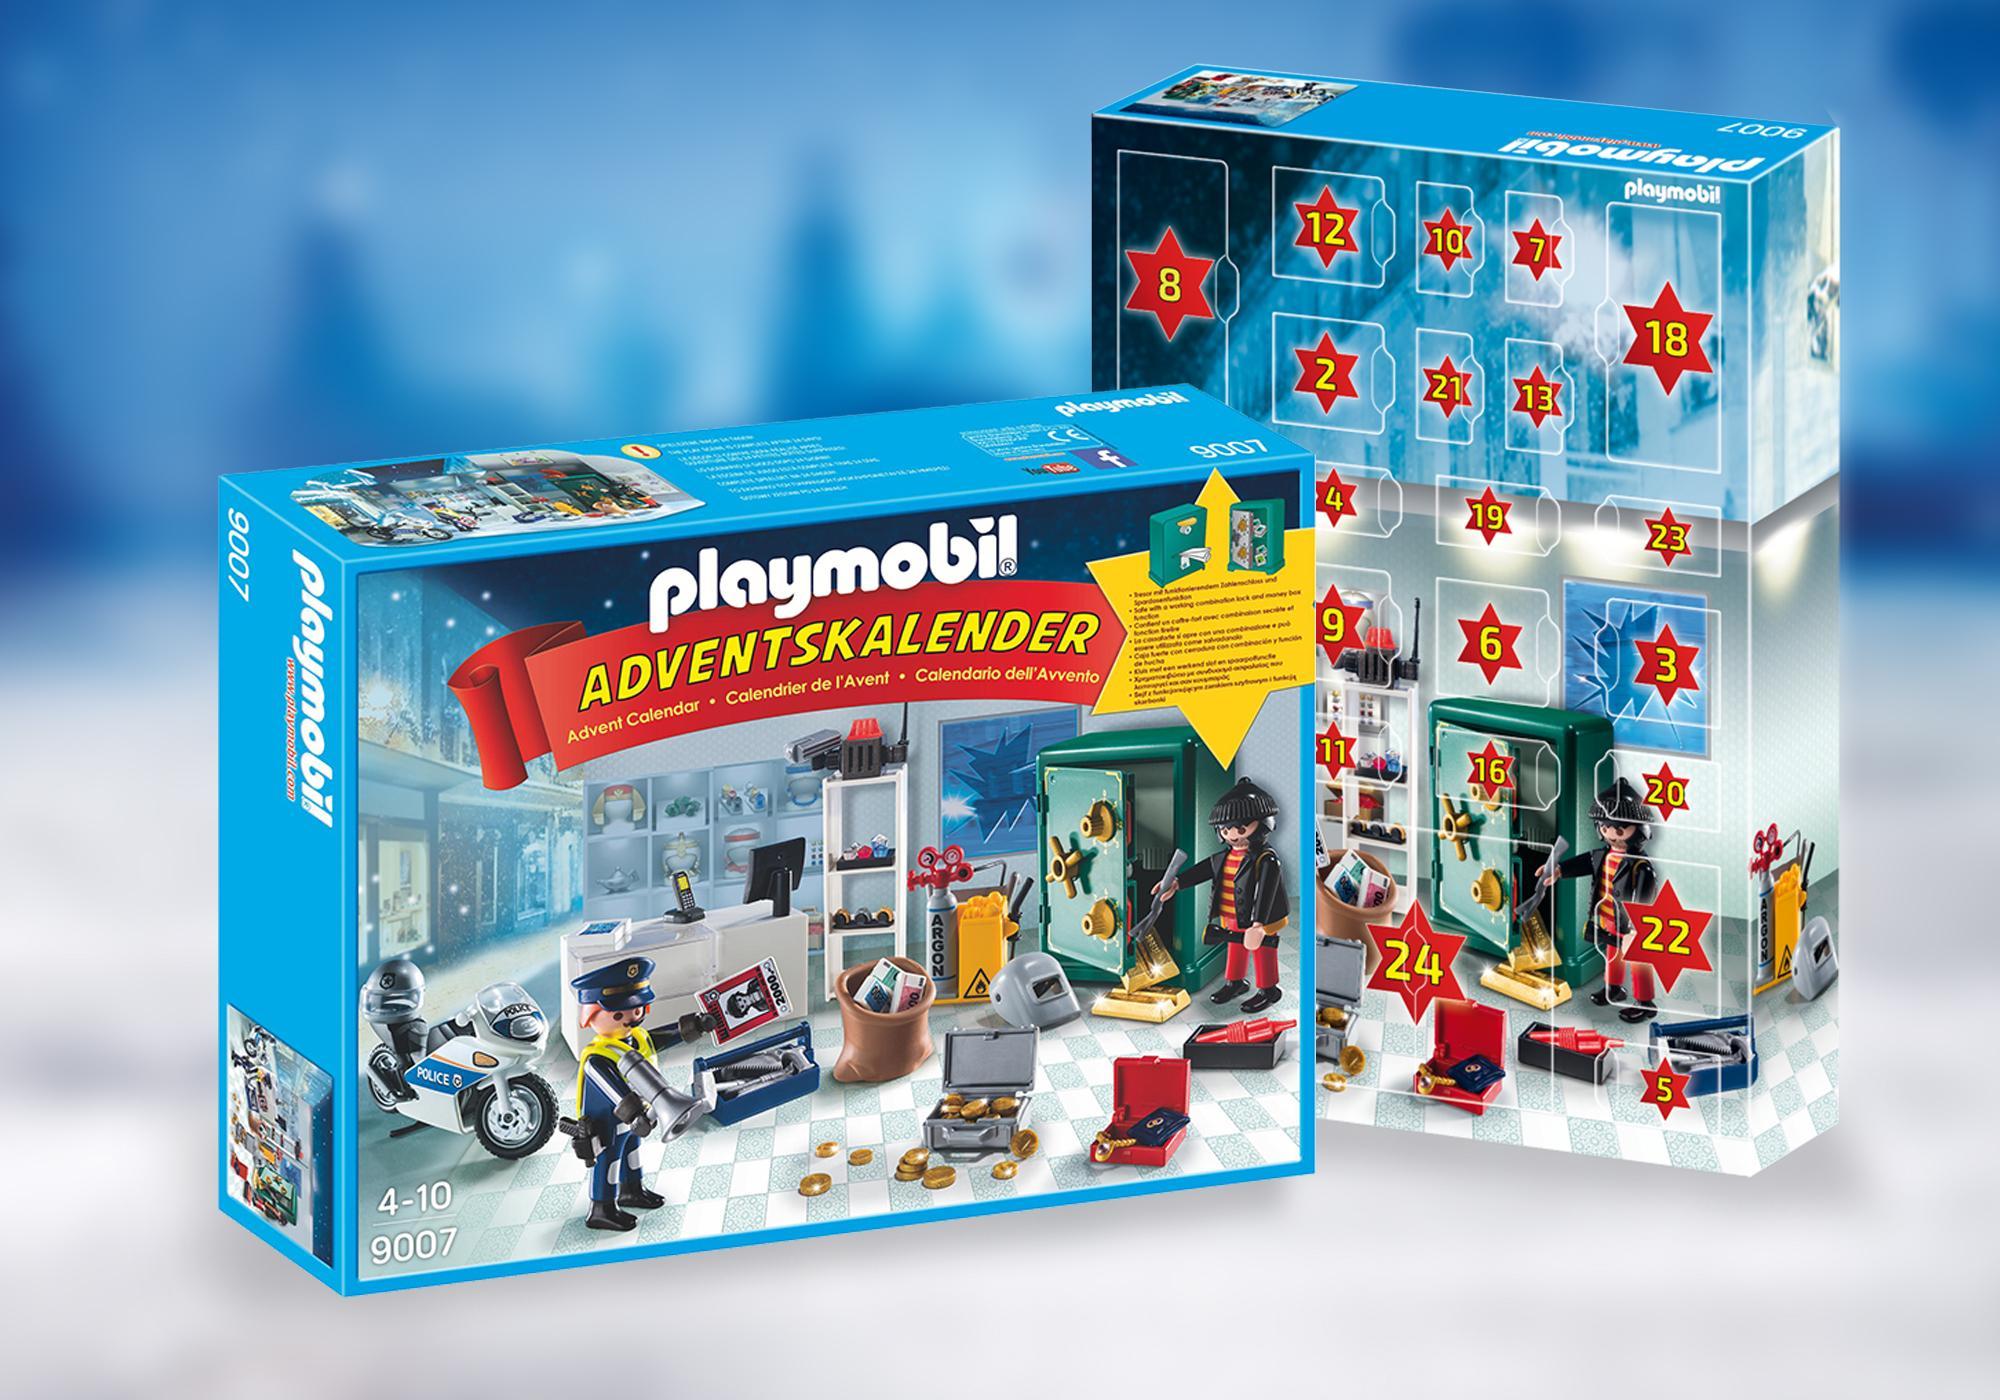 http://media.playmobil.com/i/playmobil/9007_product_detail/Calendario de Navidad - Robo en la Joyería